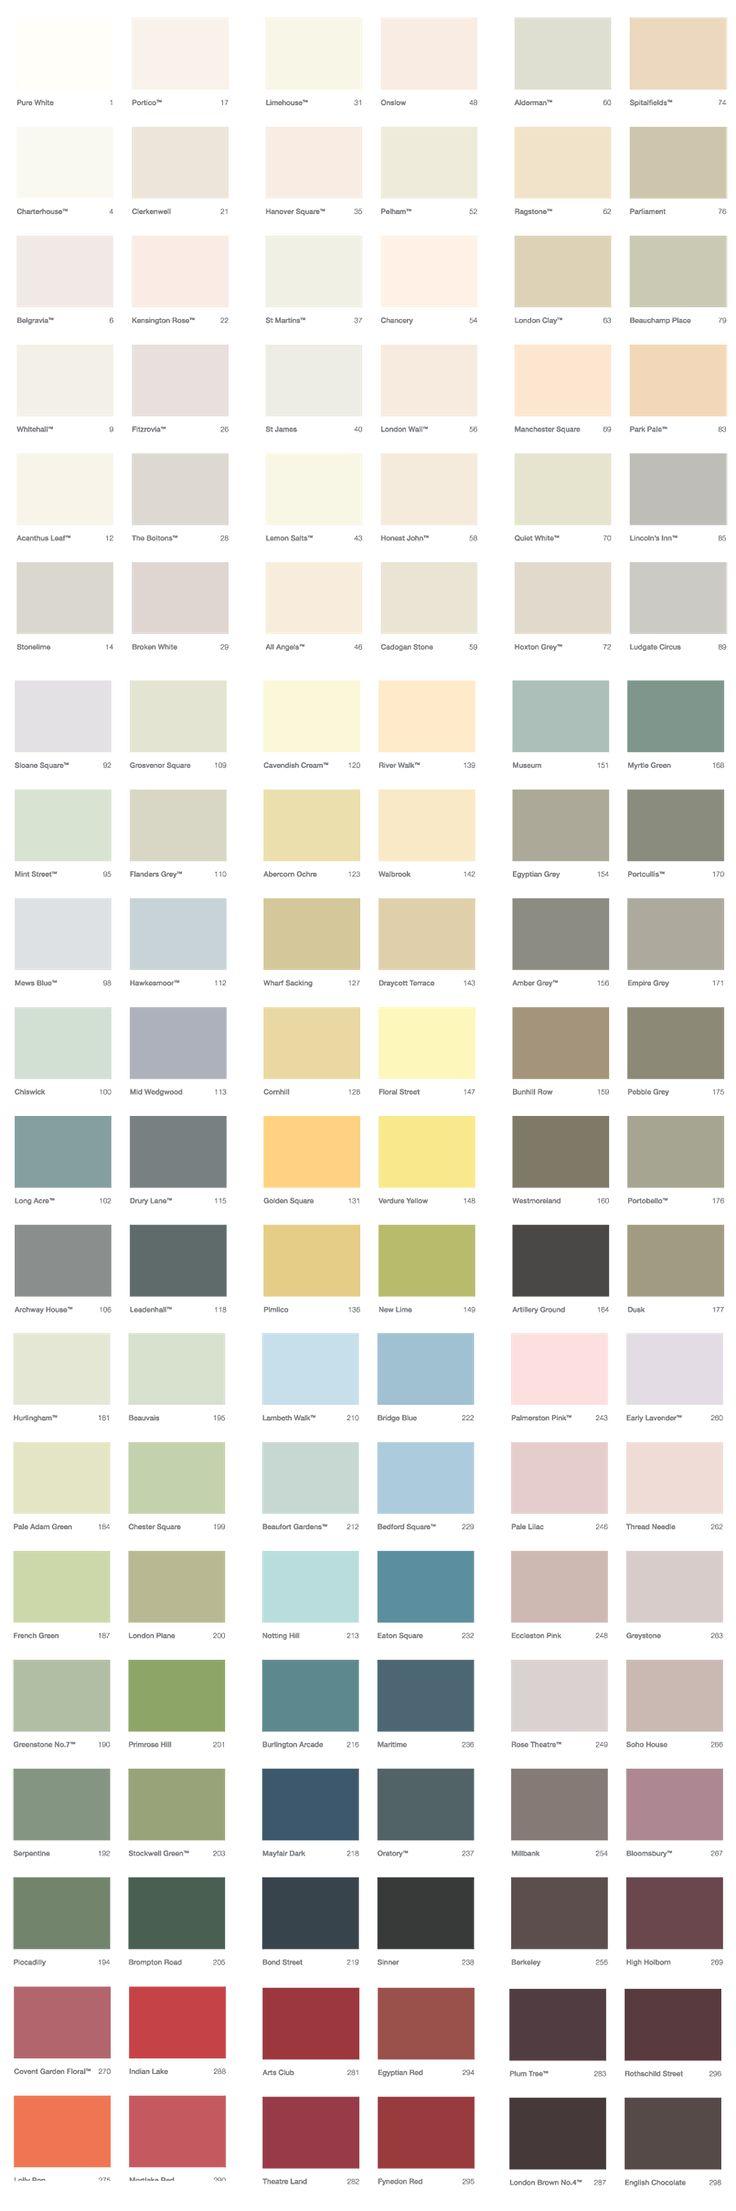 We paint our bespoke kitchens with 12 coats of Mylands of London paint | Middleton Bespoke | www.middleton-bespoke.co.uk